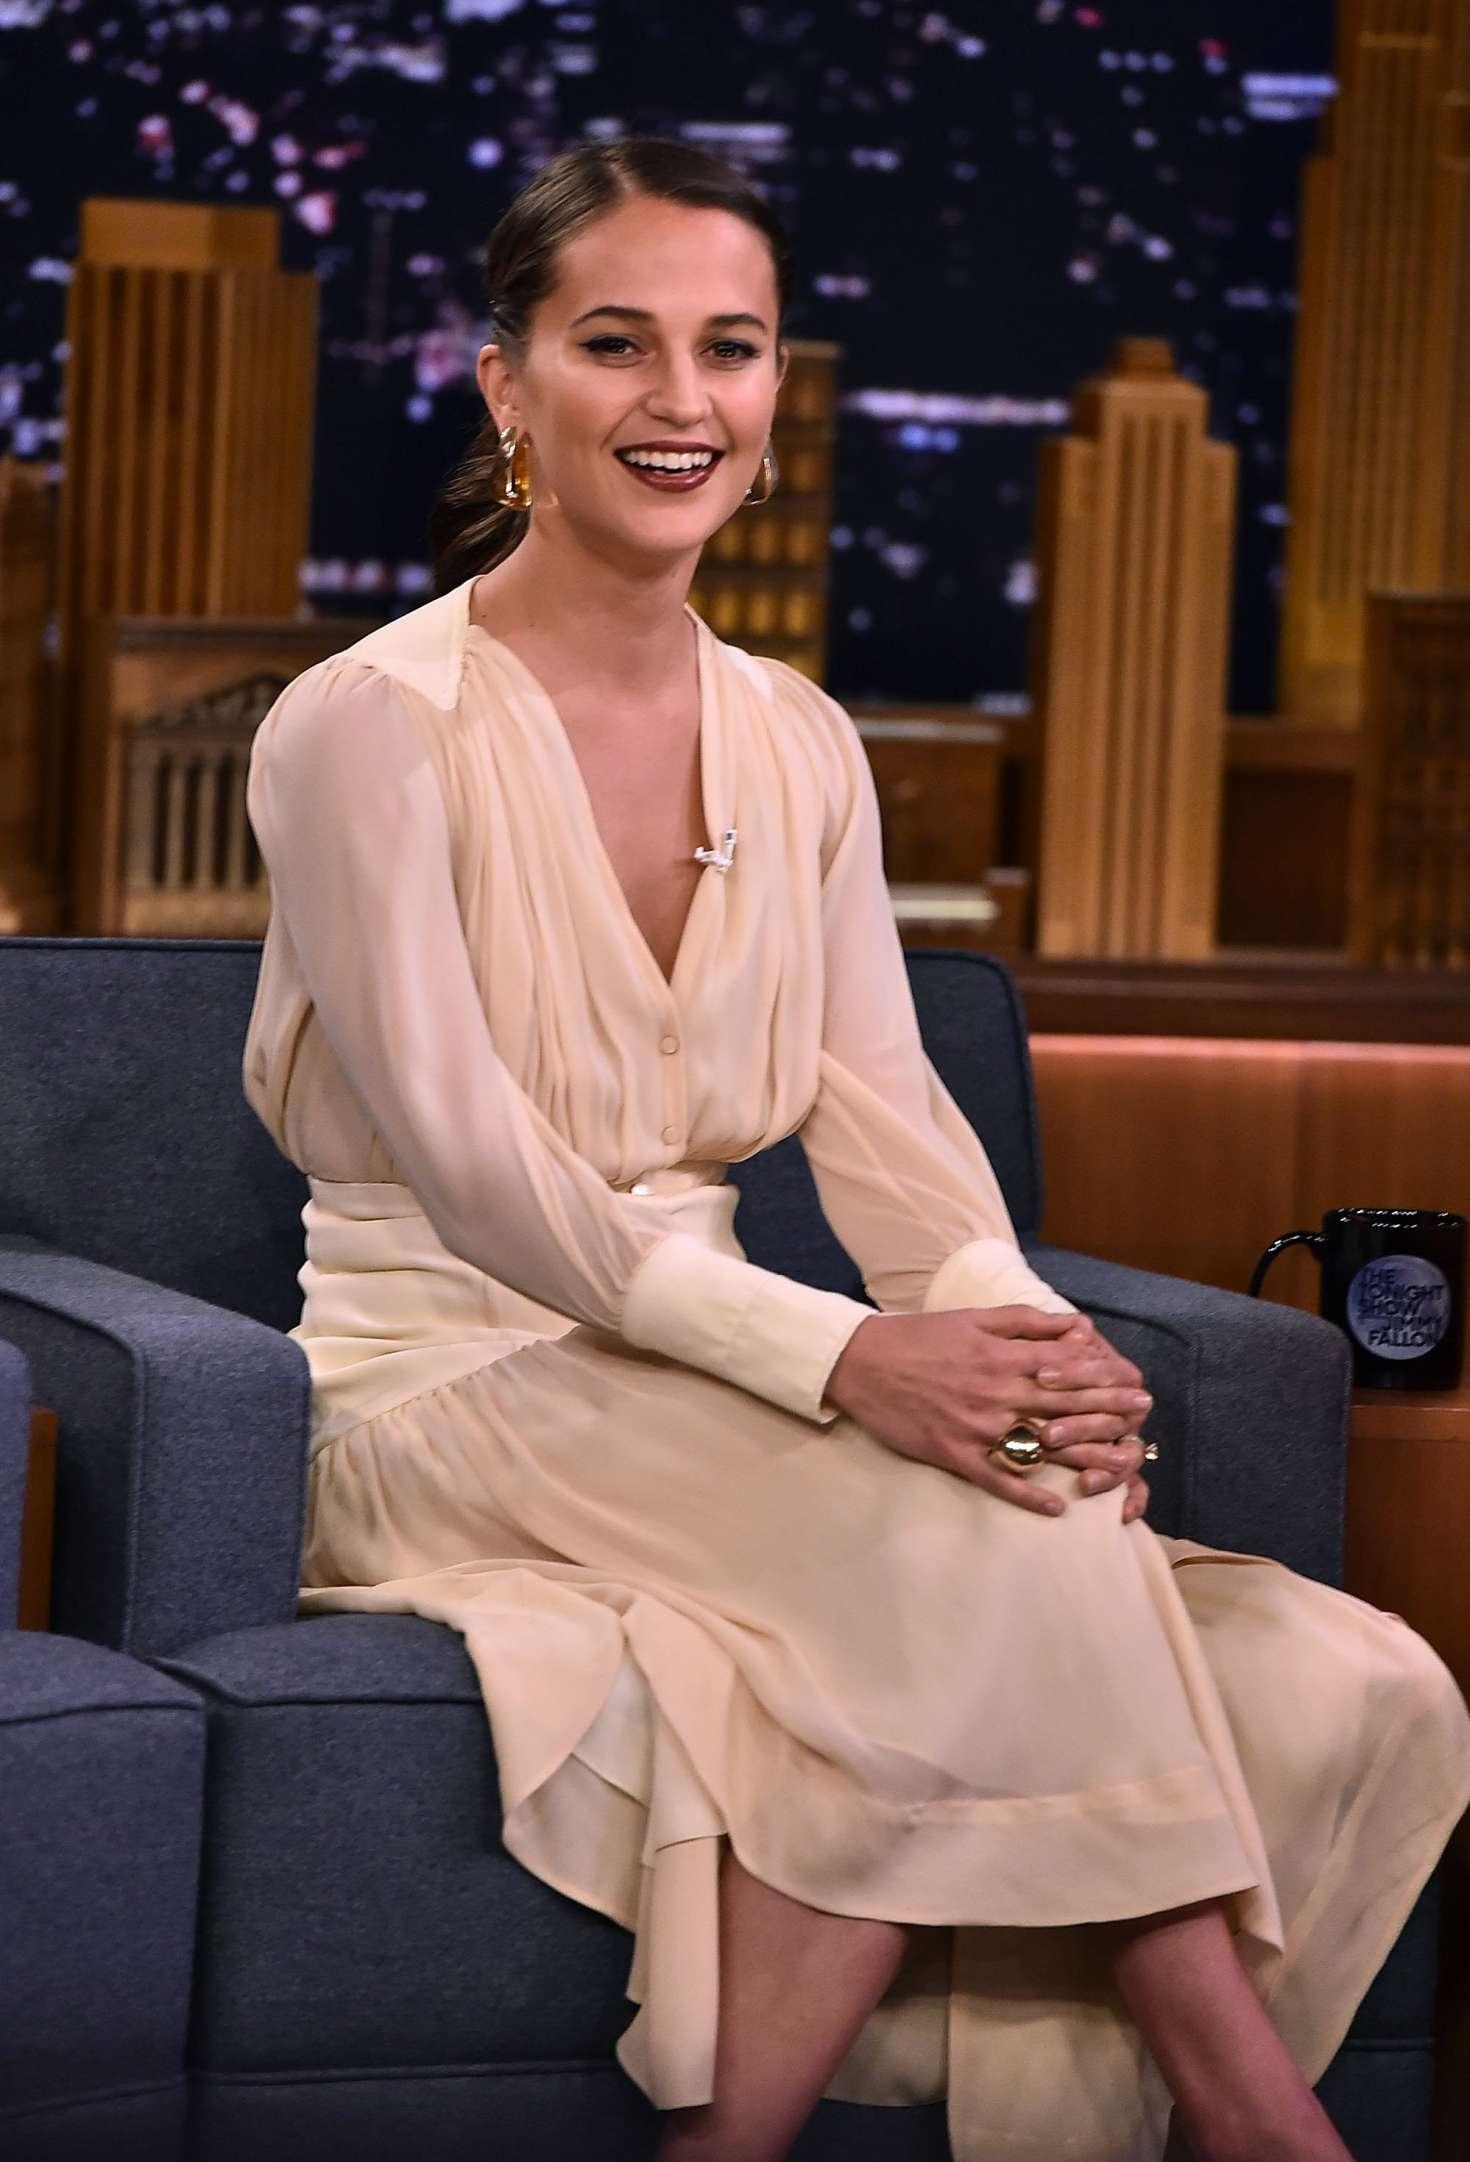 Alicia Vikander - 'The Tonight Show Starring Jimmy Fallon' in NYC